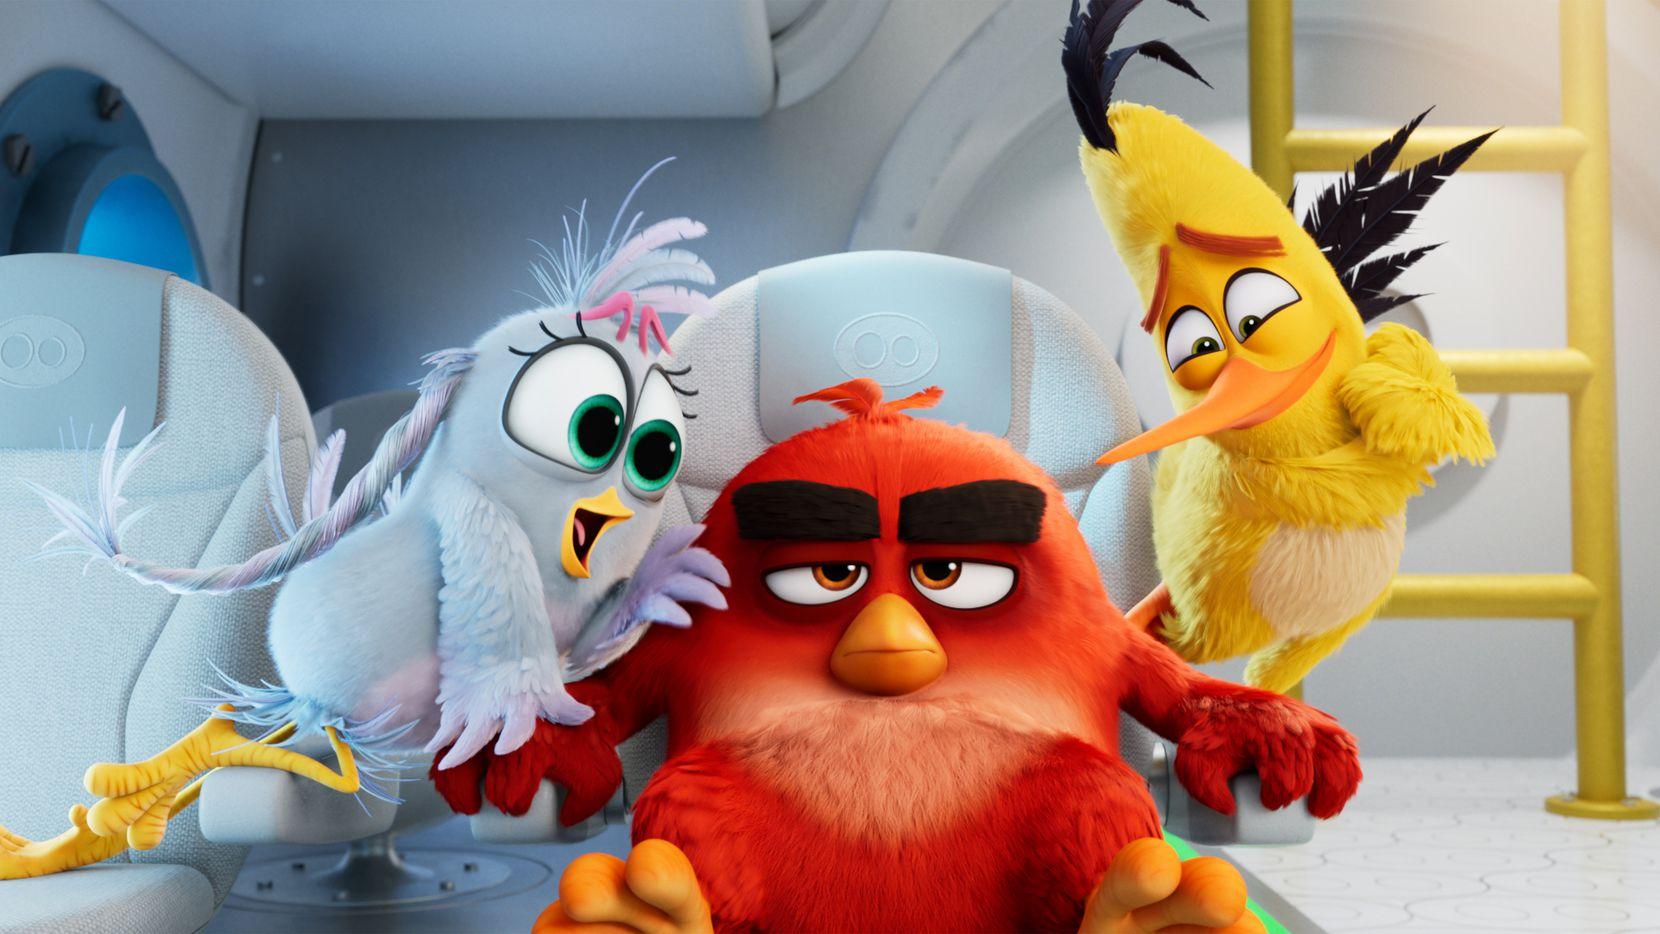 Silver (Rachel Bloom), Red (Jason Sudeikis) y Chuck (Josh Gad) en Angry Birds 2.